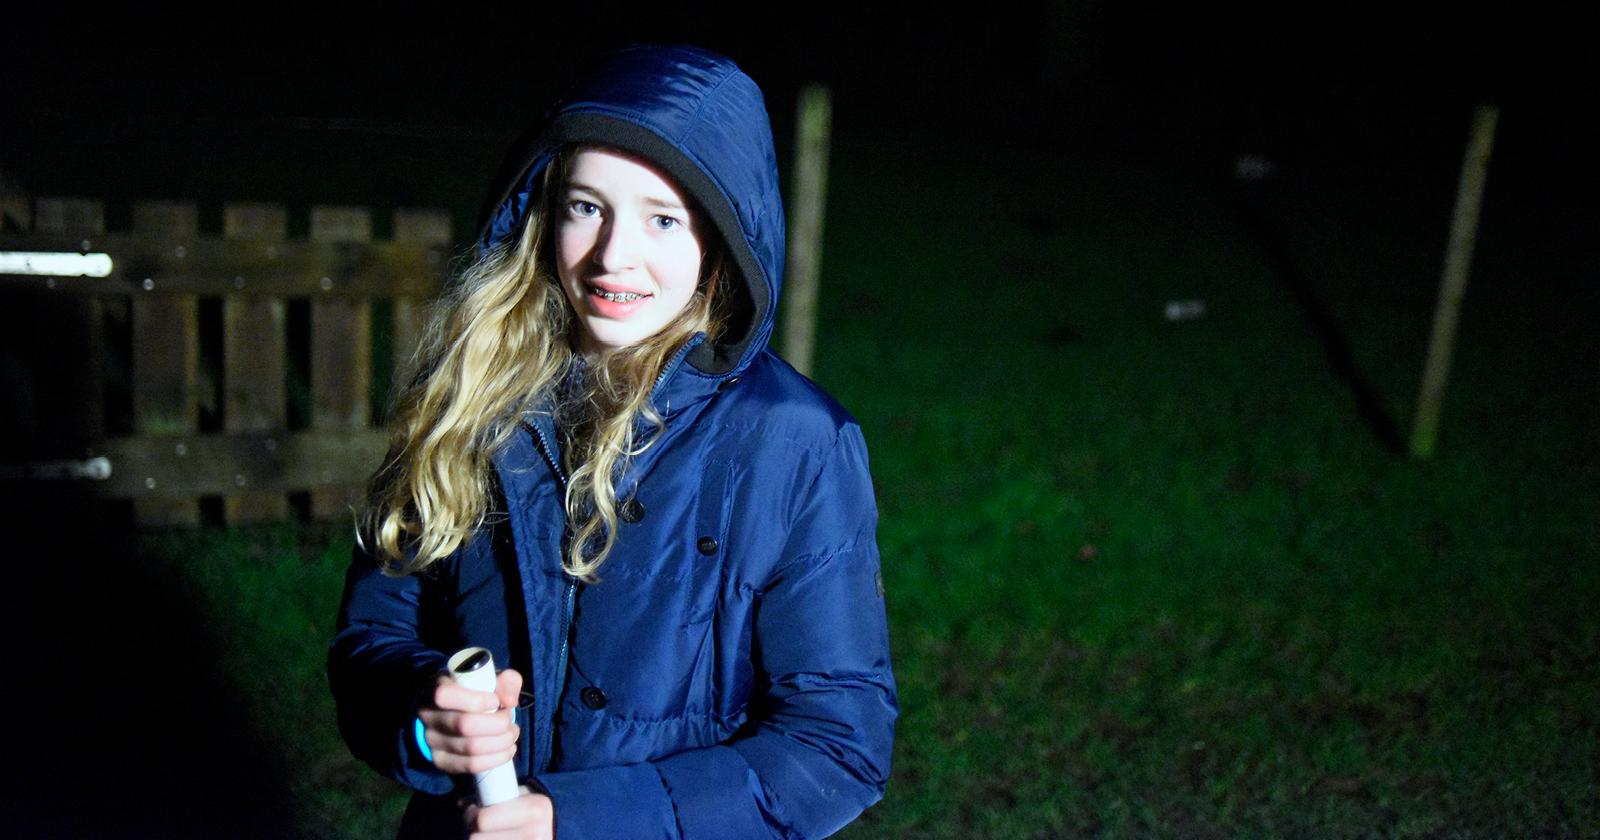 frissewind-foto-reportage7-Lauren